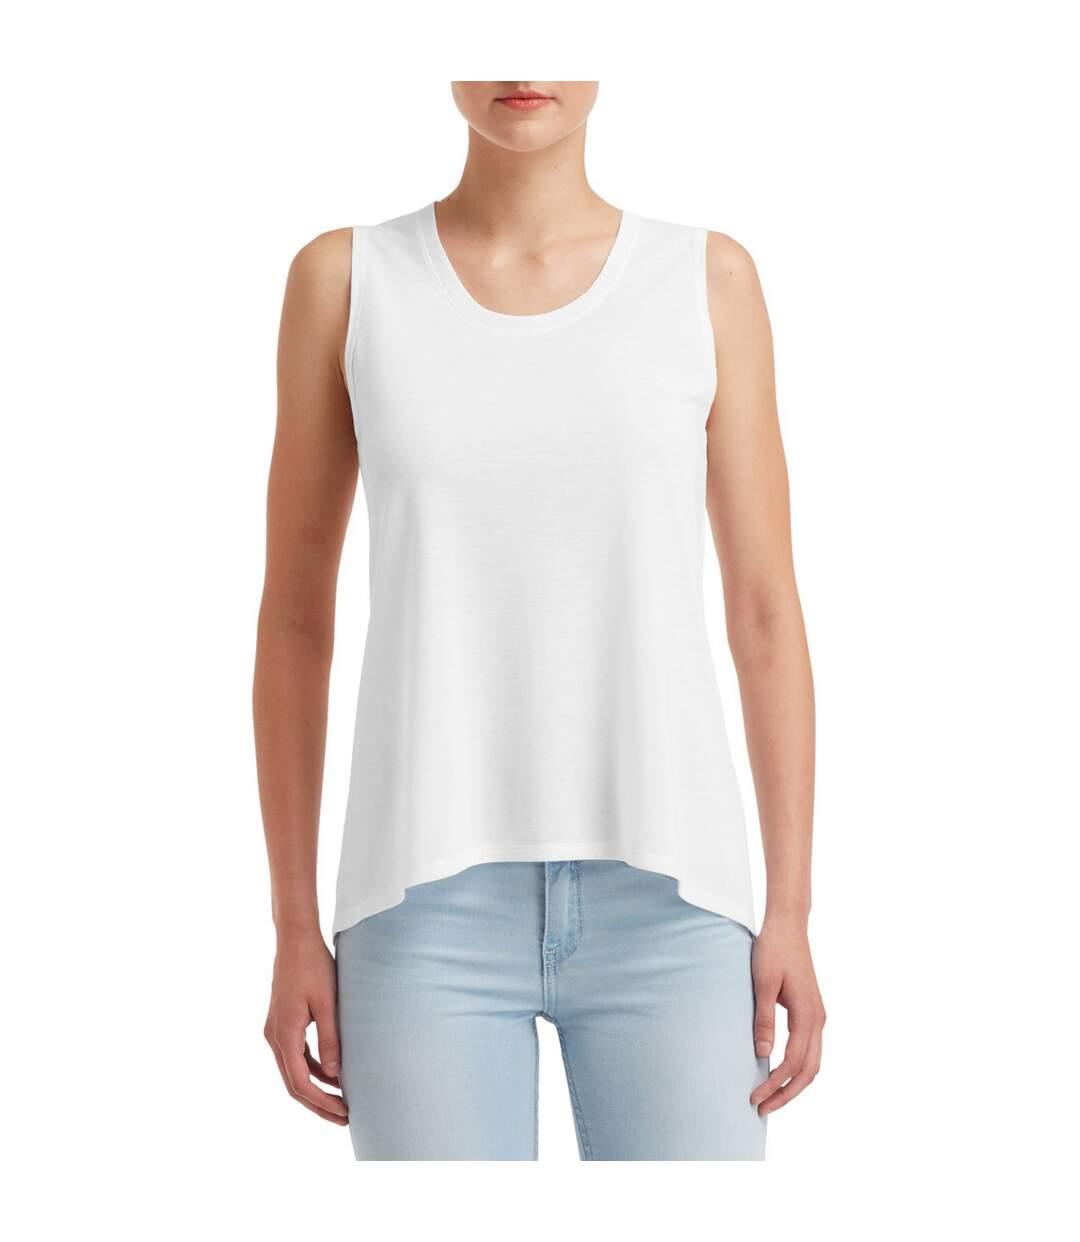 Anvil - T-Shirt Sans Manches - Femme (Blanc) - UTBC4057